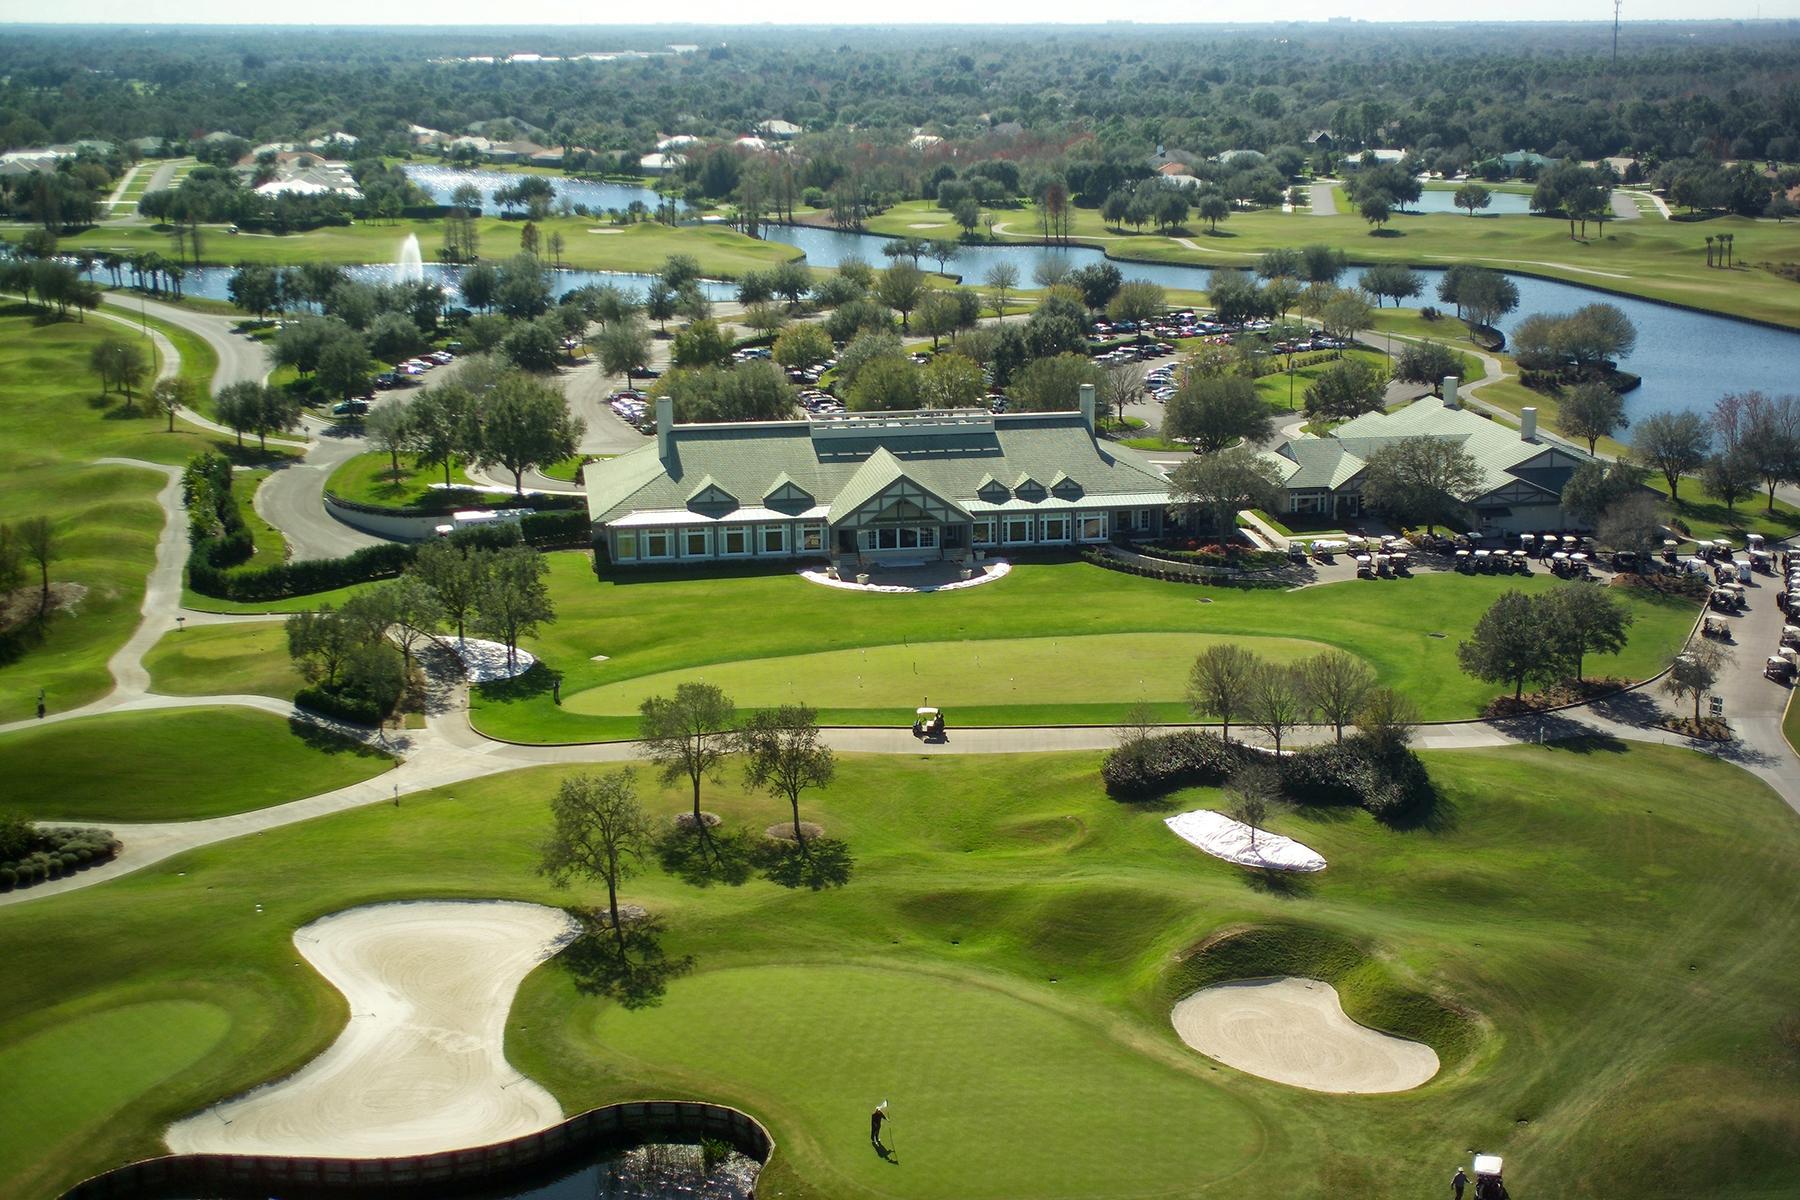 Single Family Home for Sale at LAUREL OAK ESTATES 3122 Charles Macdonald Dr, Sarasota, Florida, 34240 United States